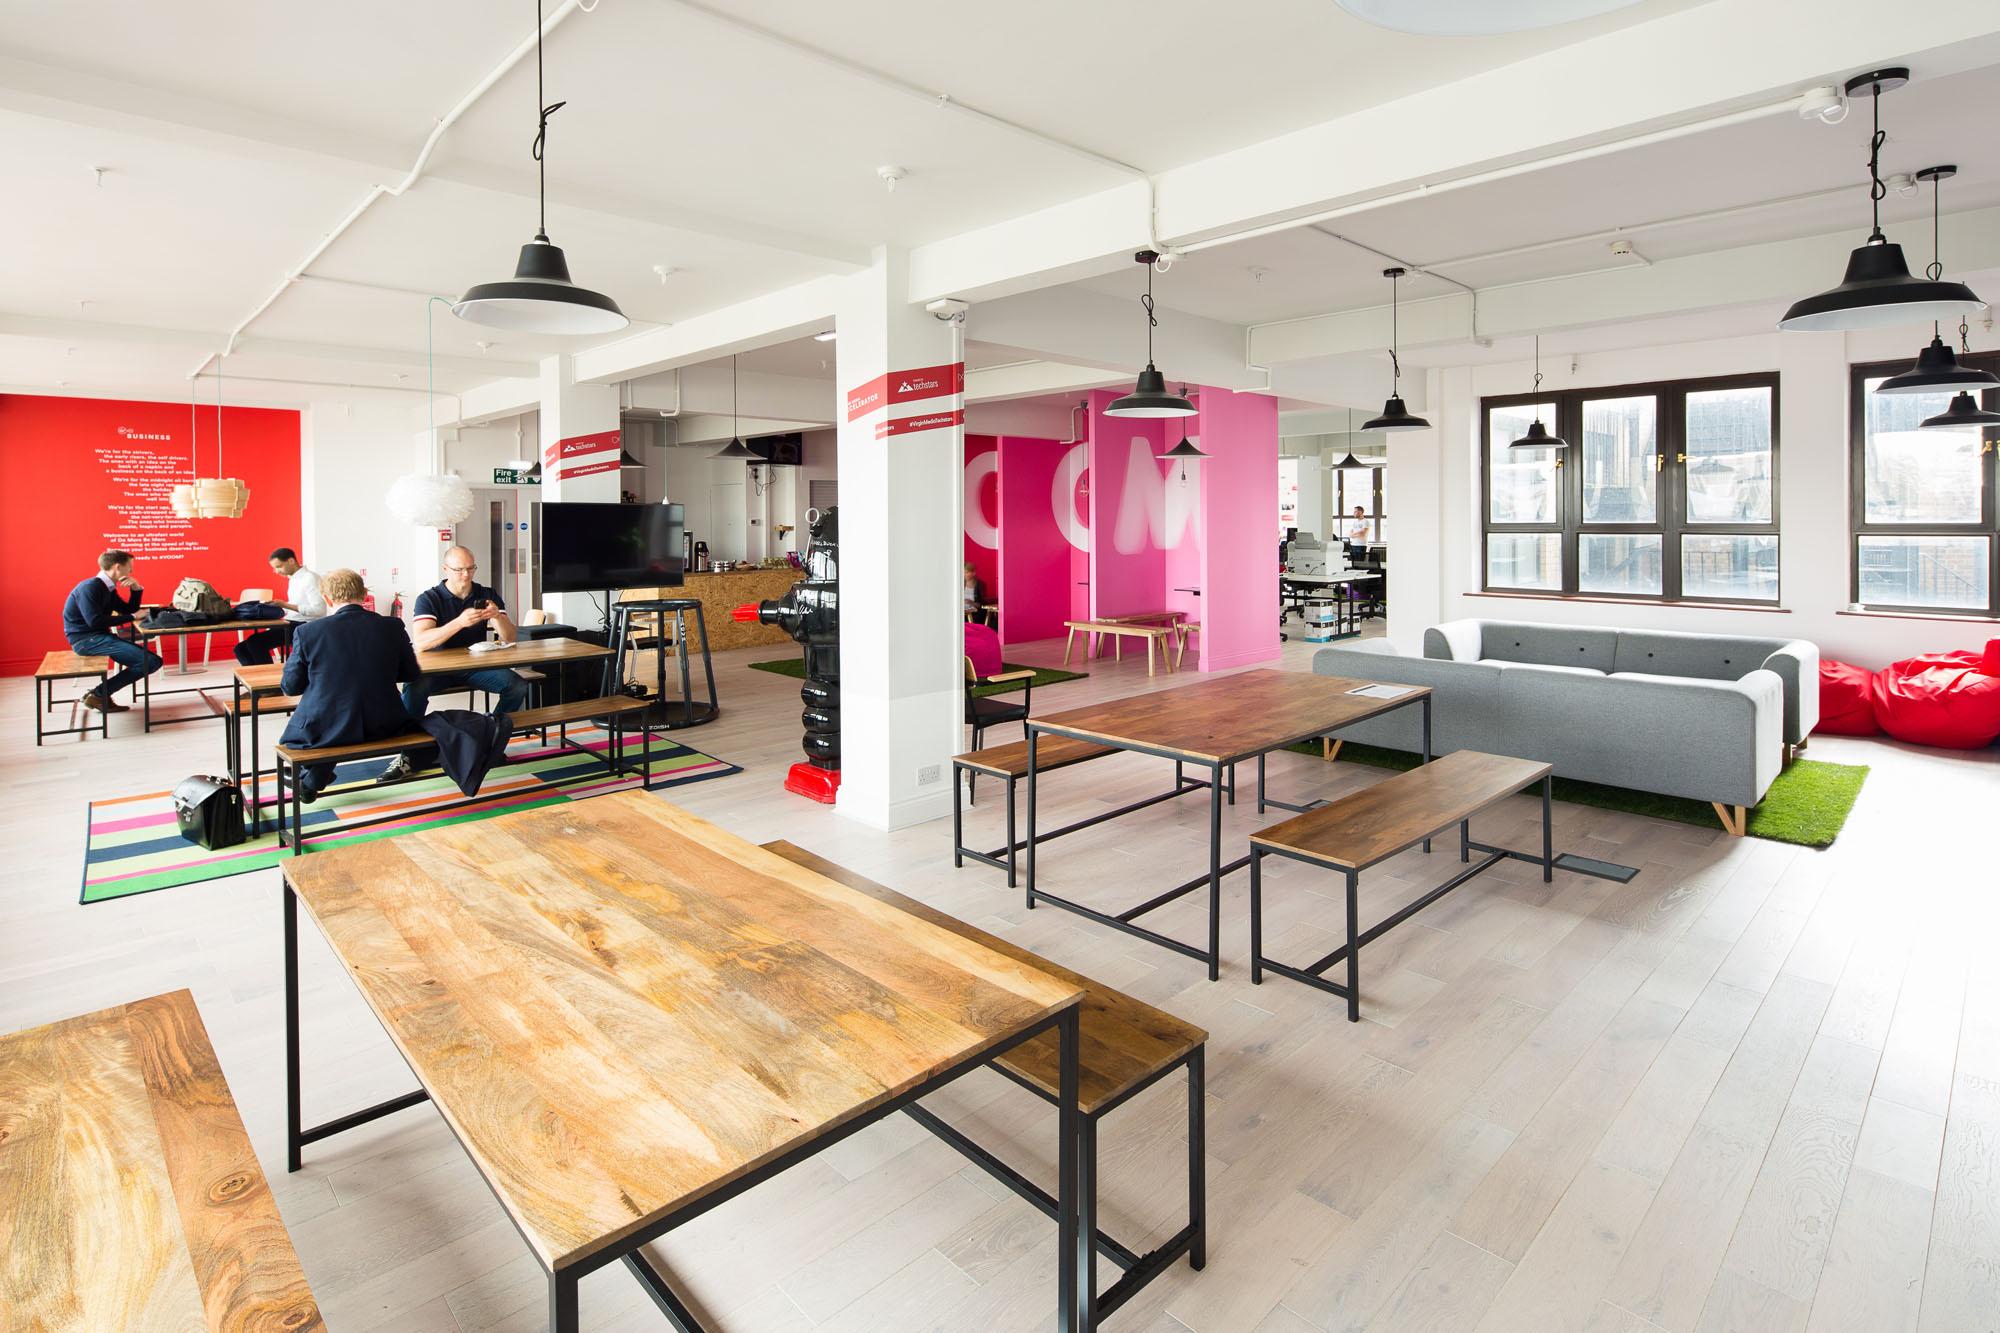 65 person workspace